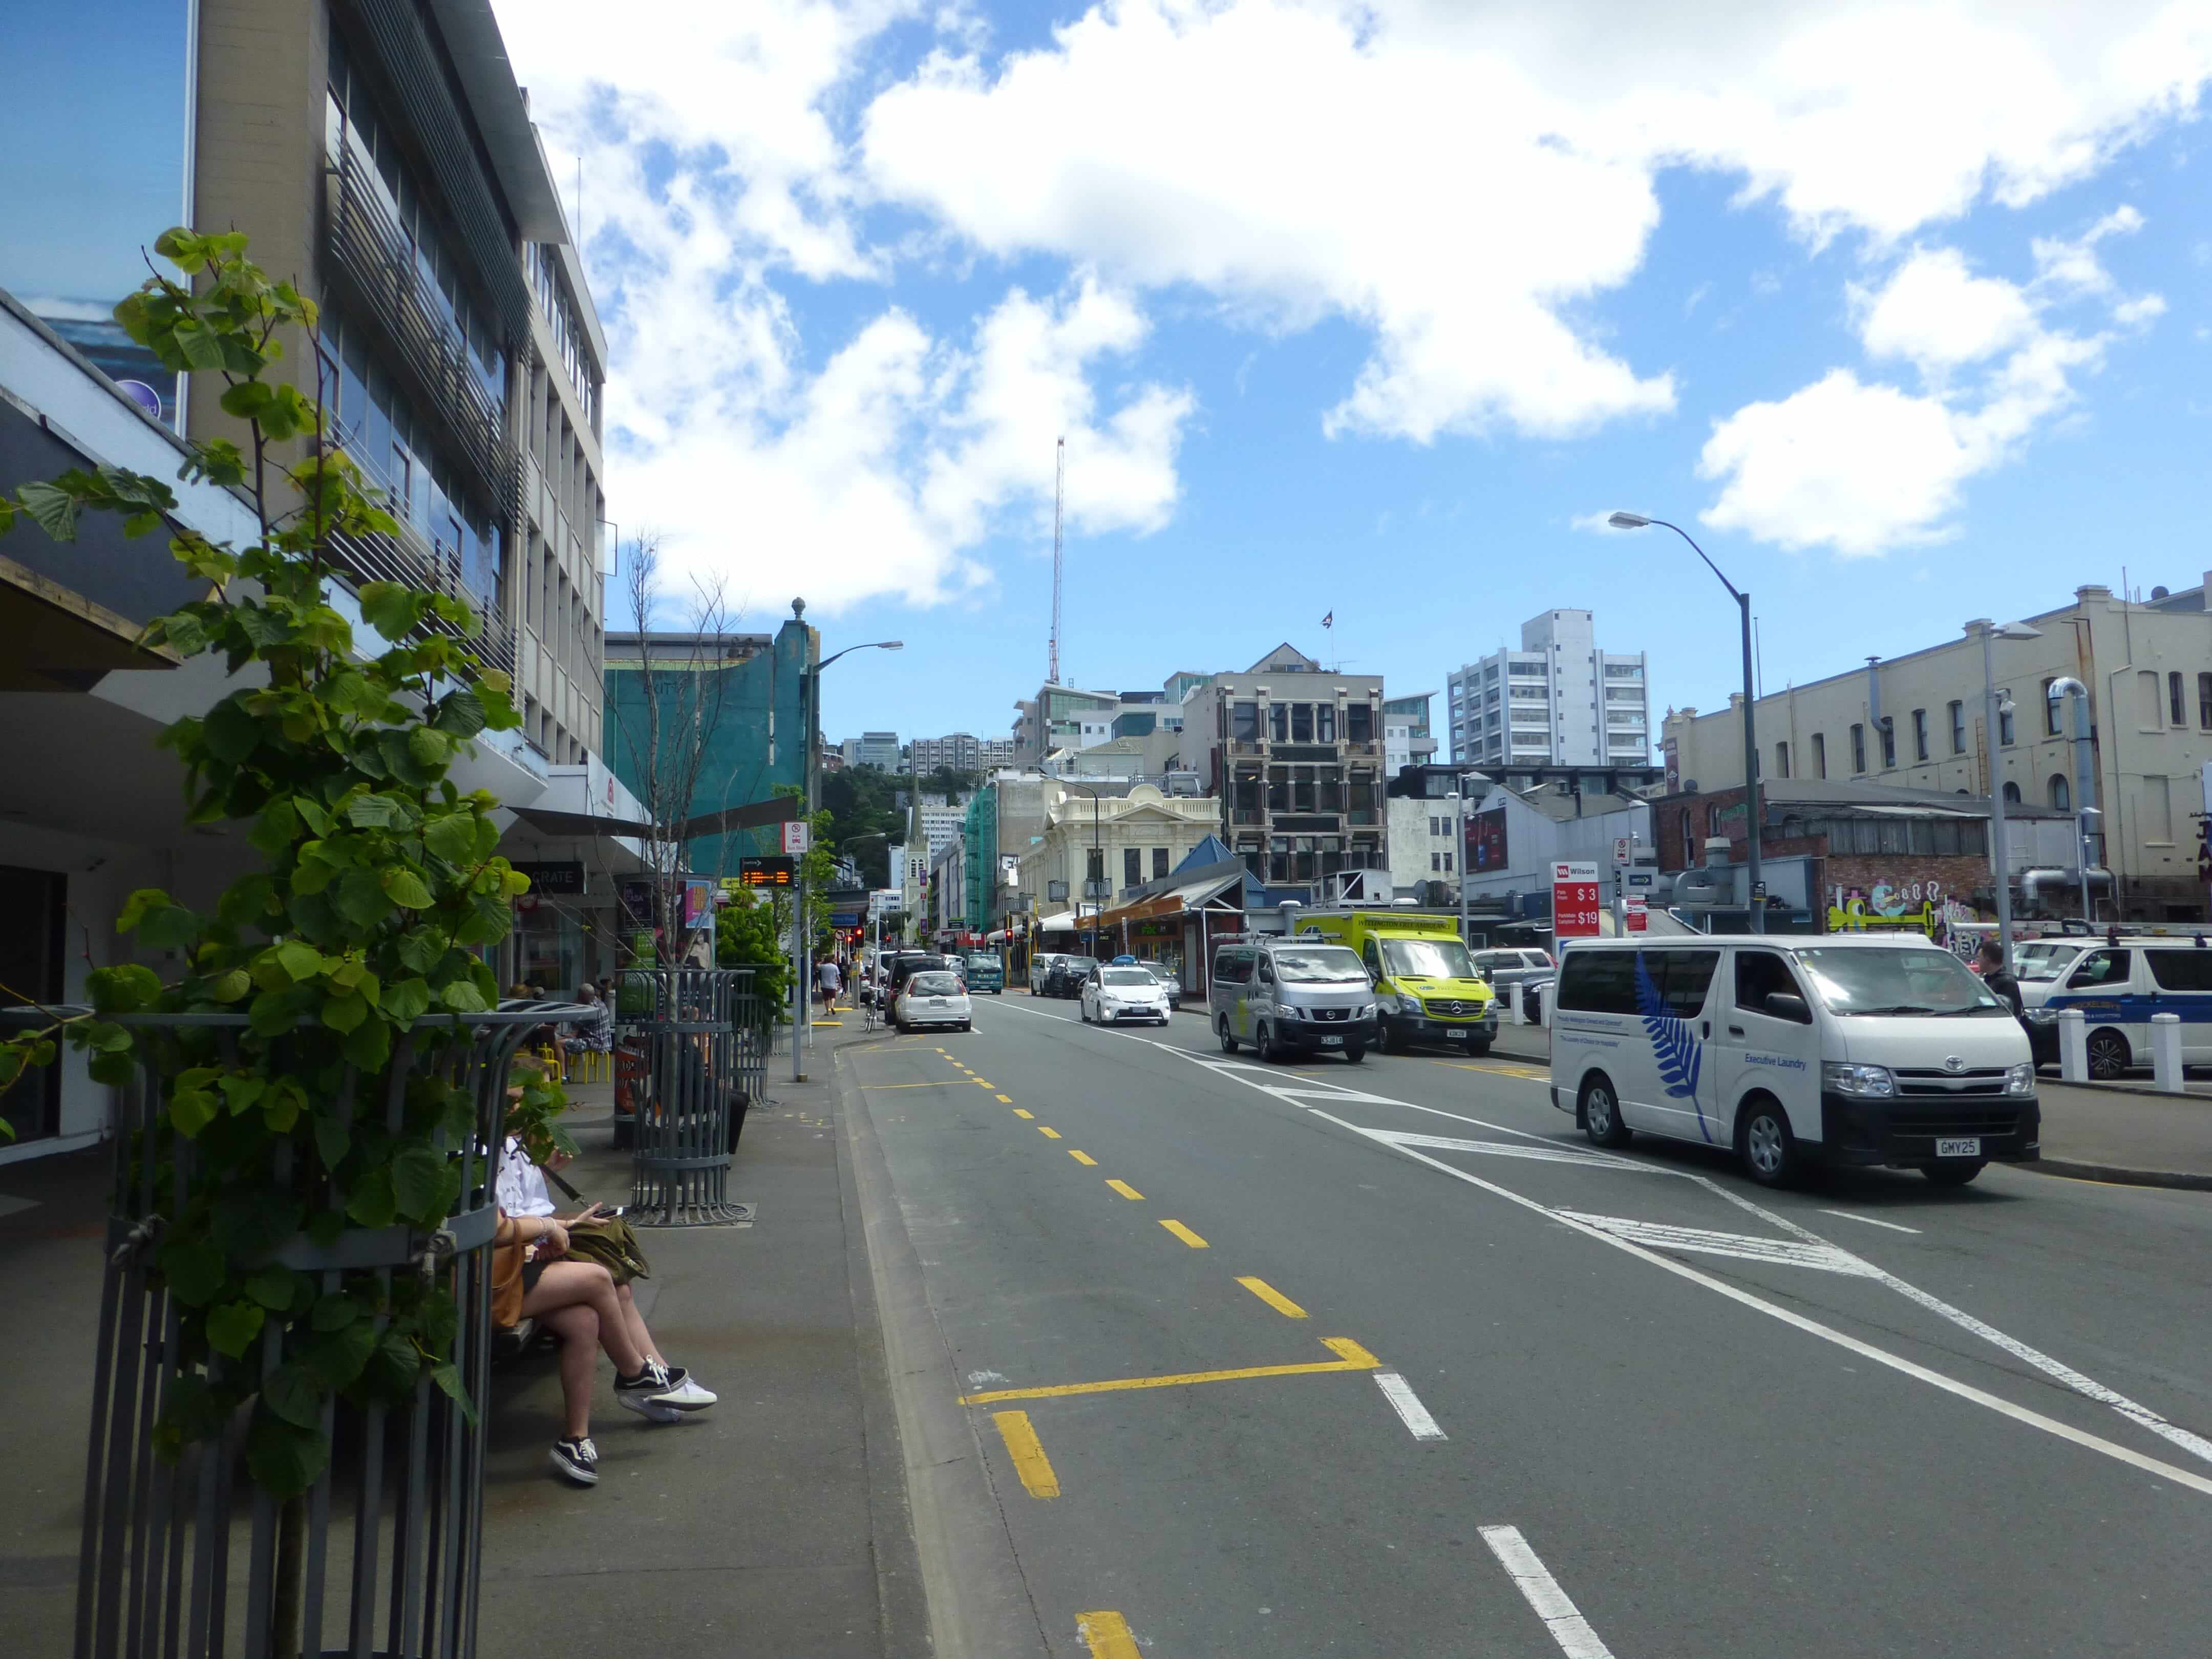 im Zentrum, Wellington, Neuseeland, Weit-weg.reisen 3